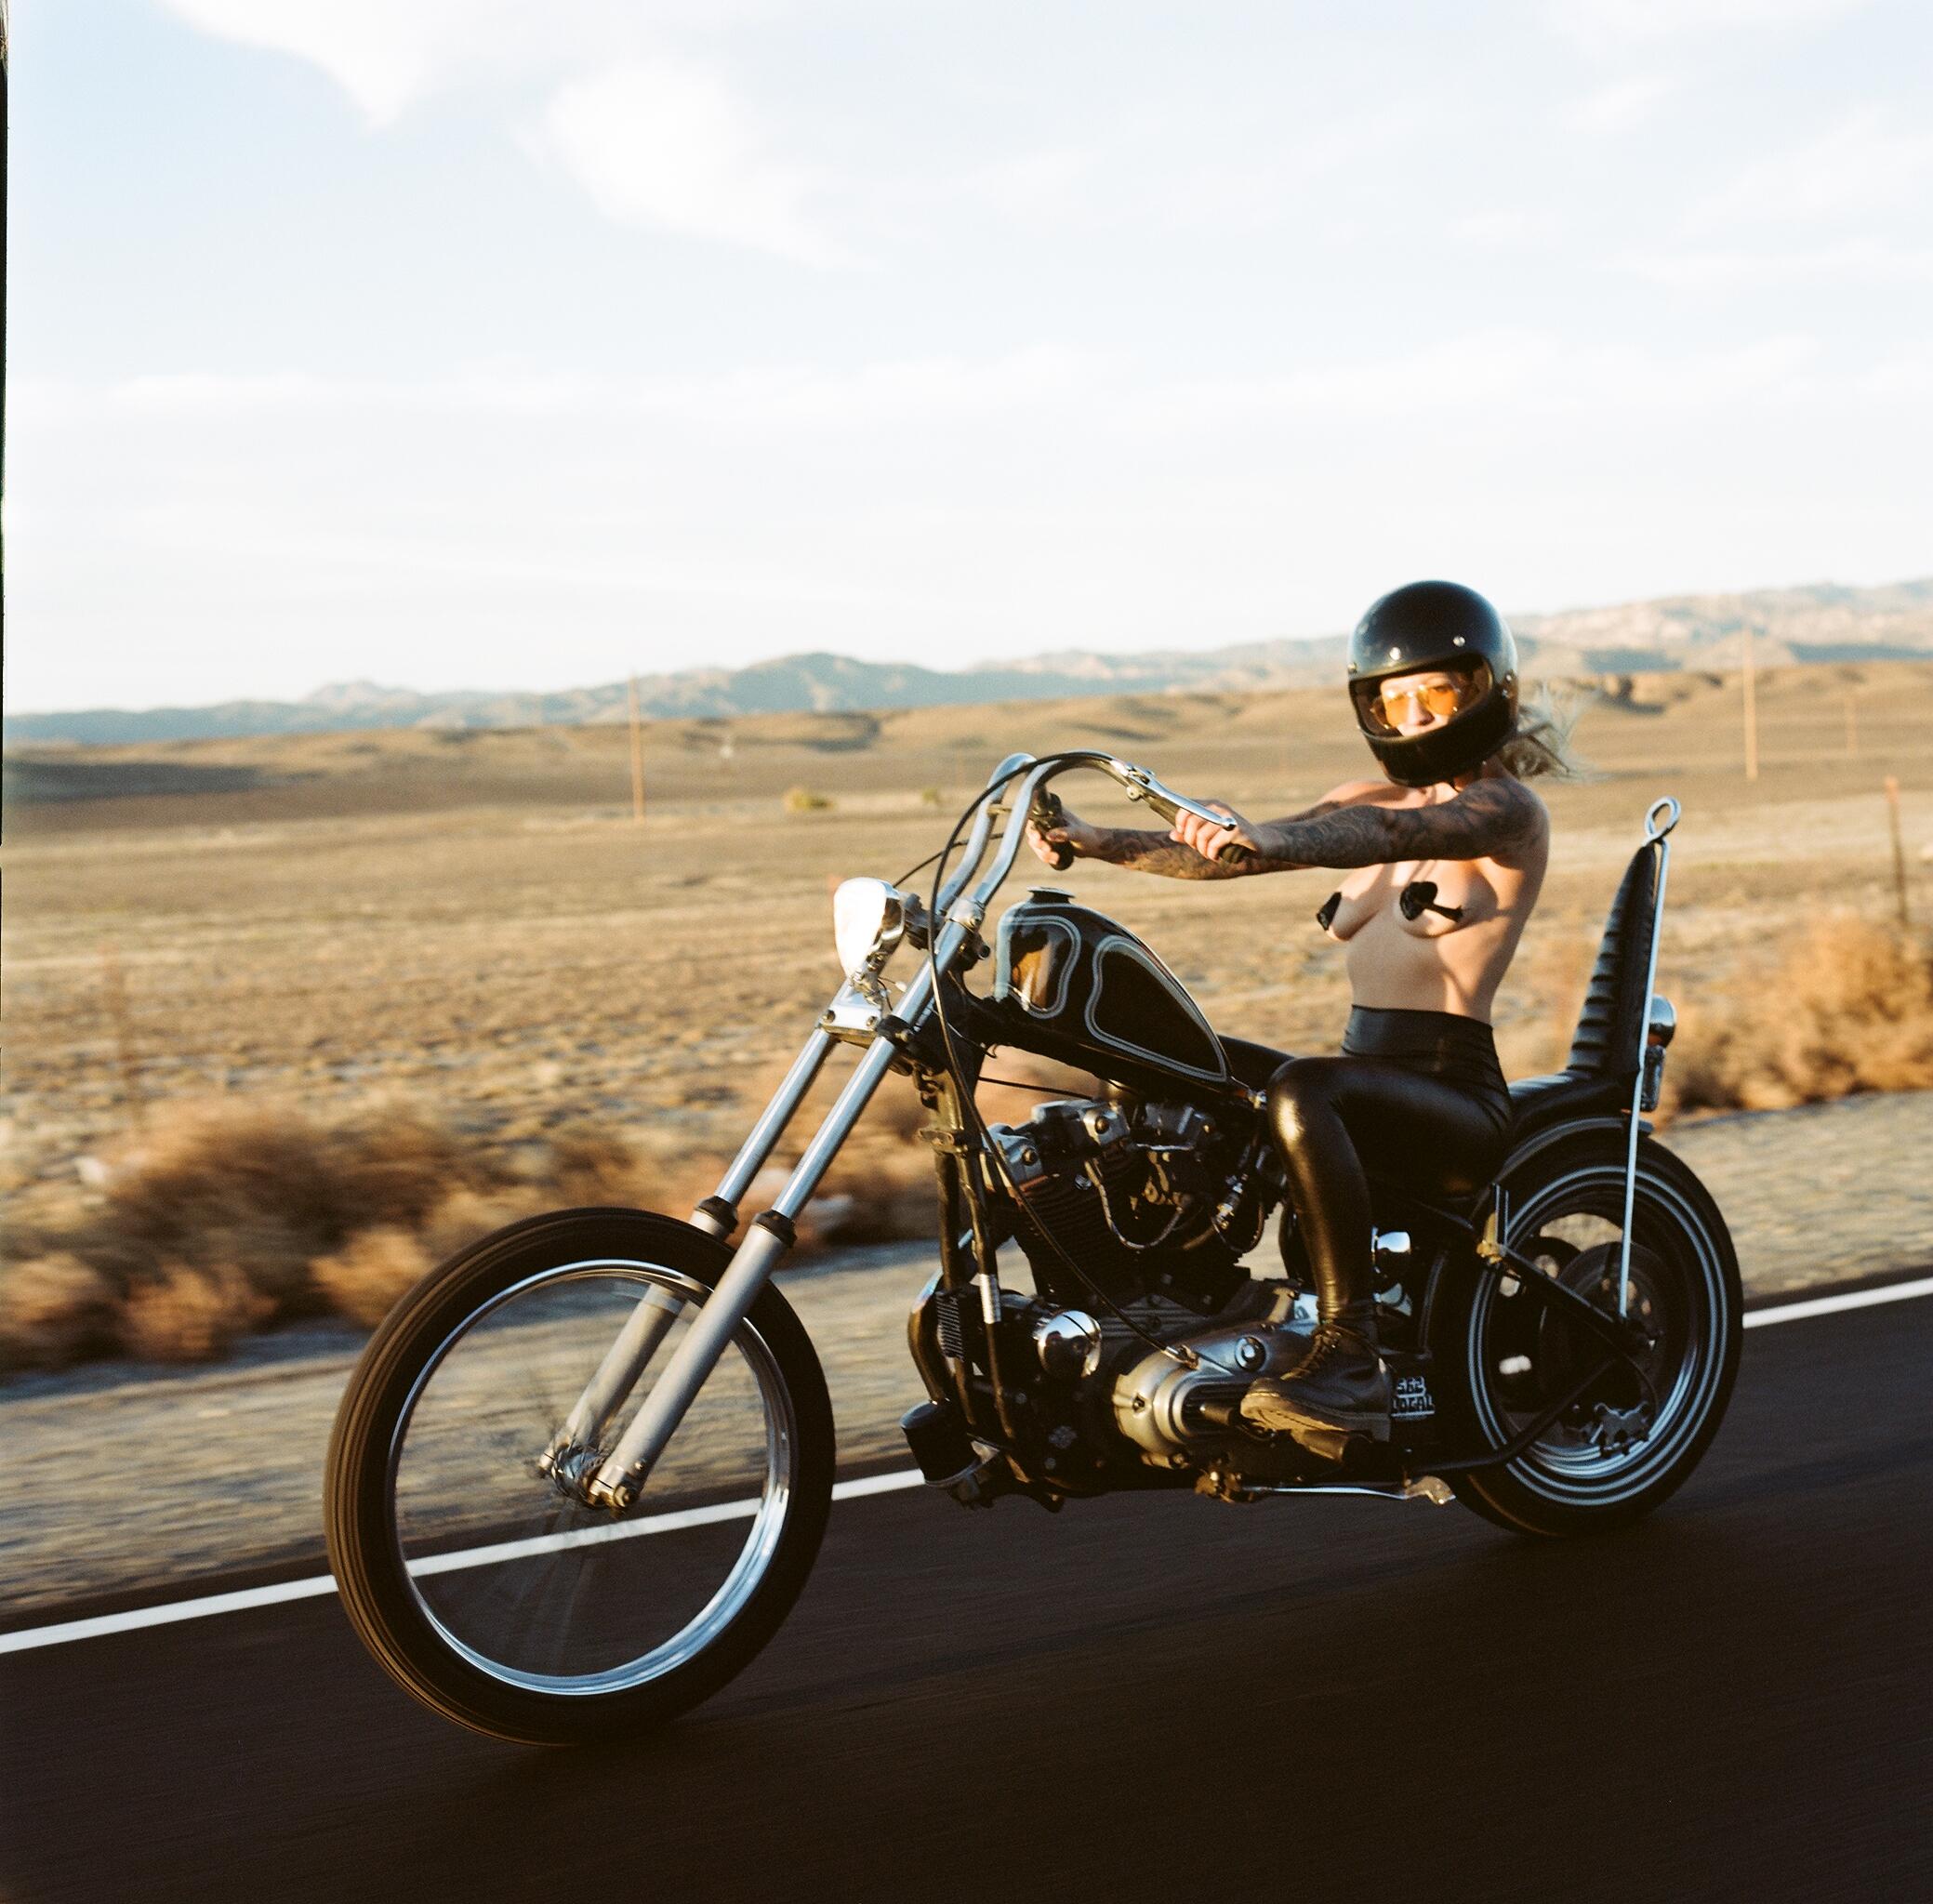 F 350 Harley Davidson 2004